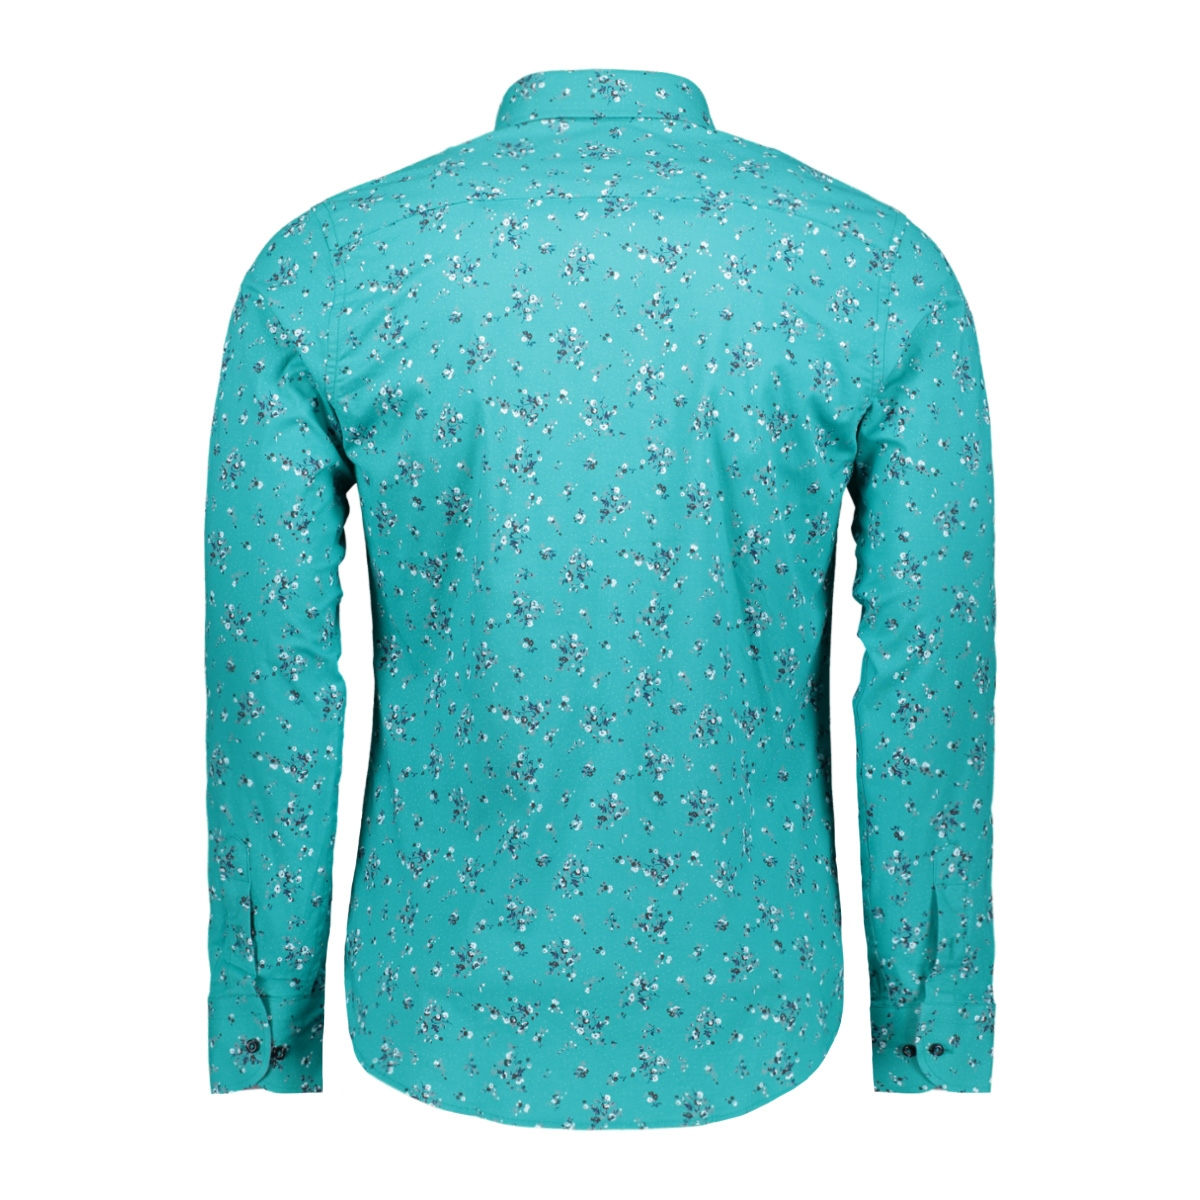 4854 35 gabbiano overhemd groen